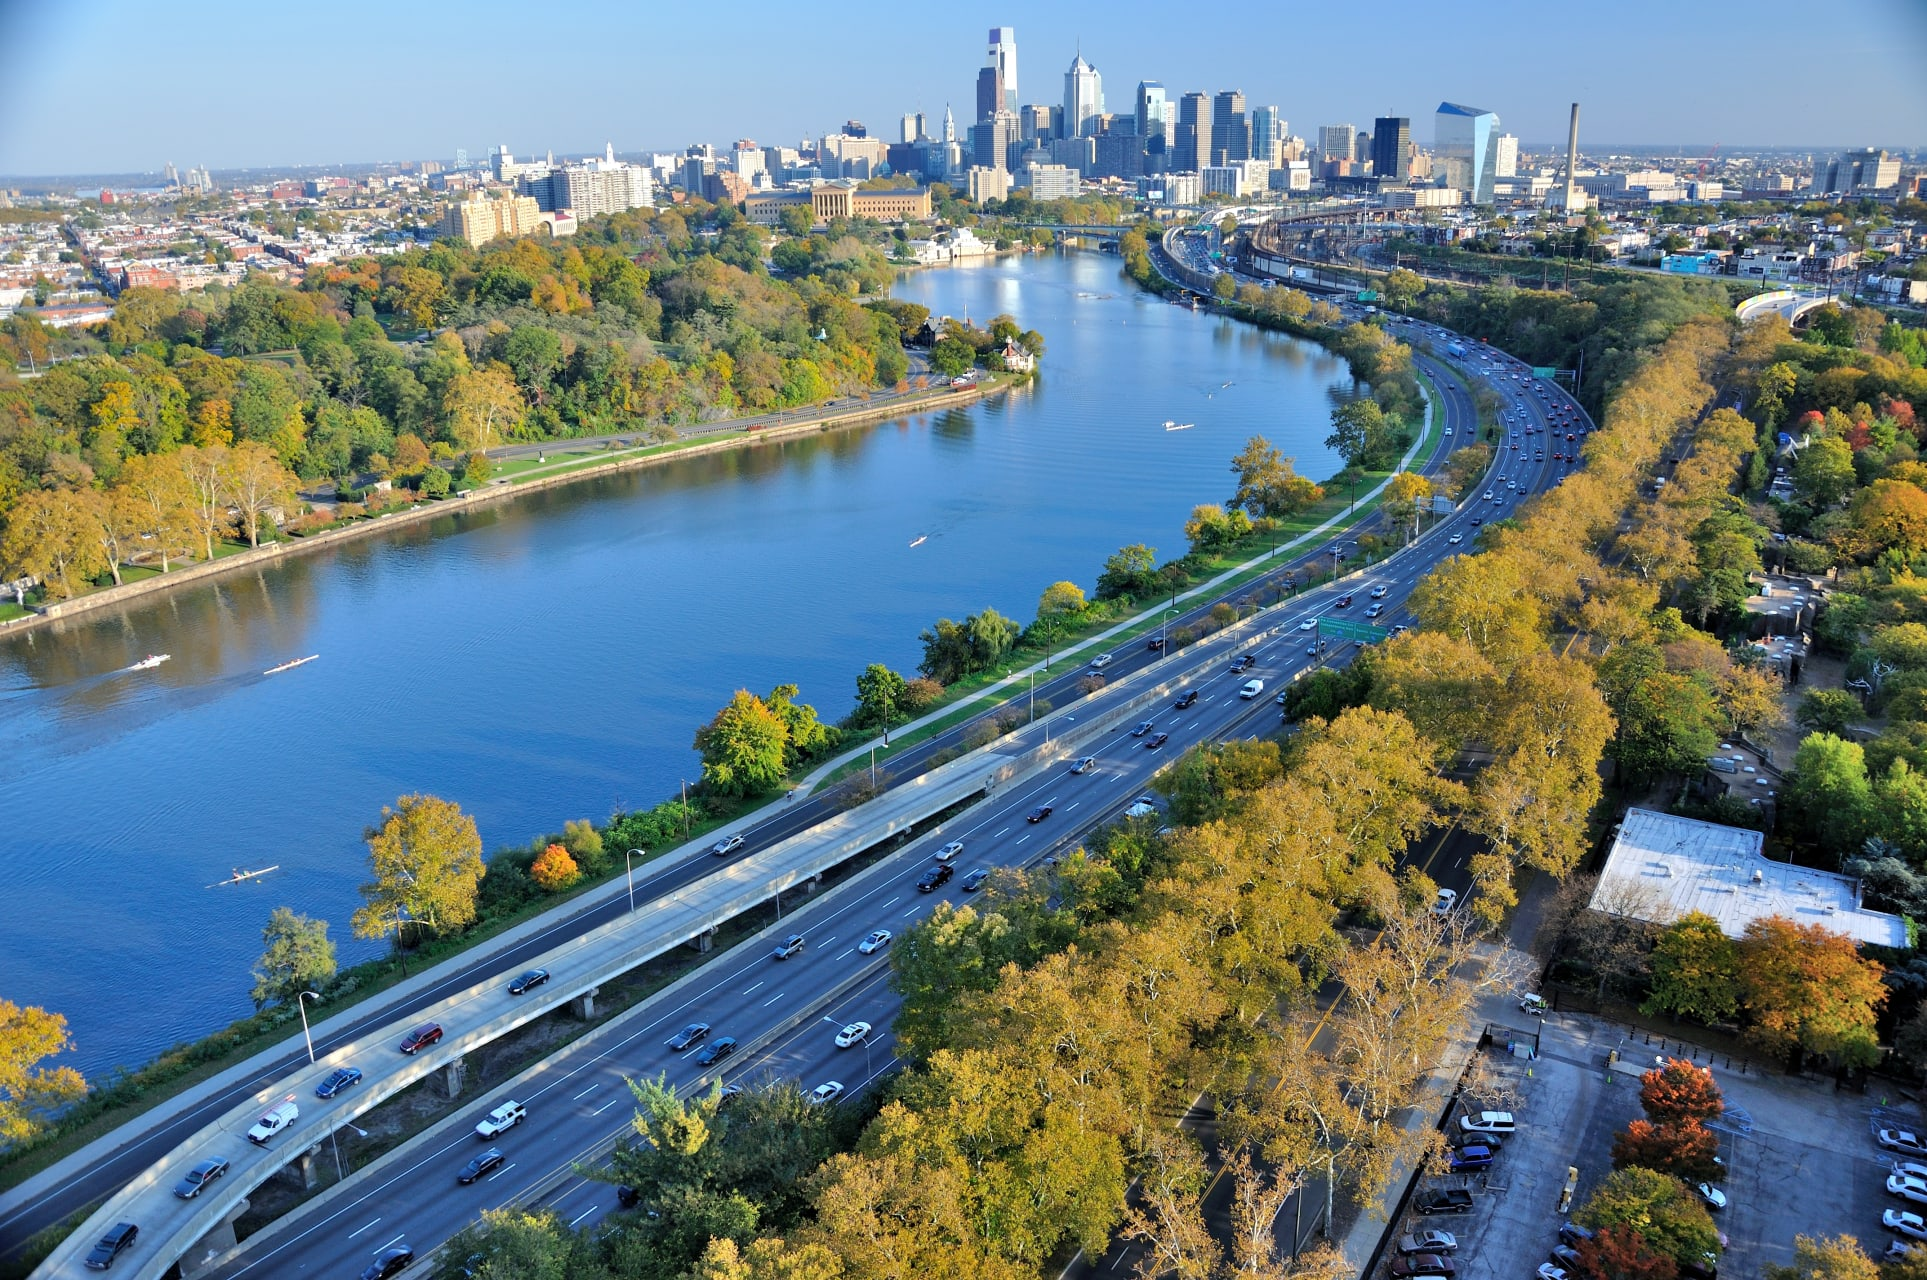 Philadelphia - Rivers, Royalty and Rocky Balboa: Philadelphia's Schuylkill River